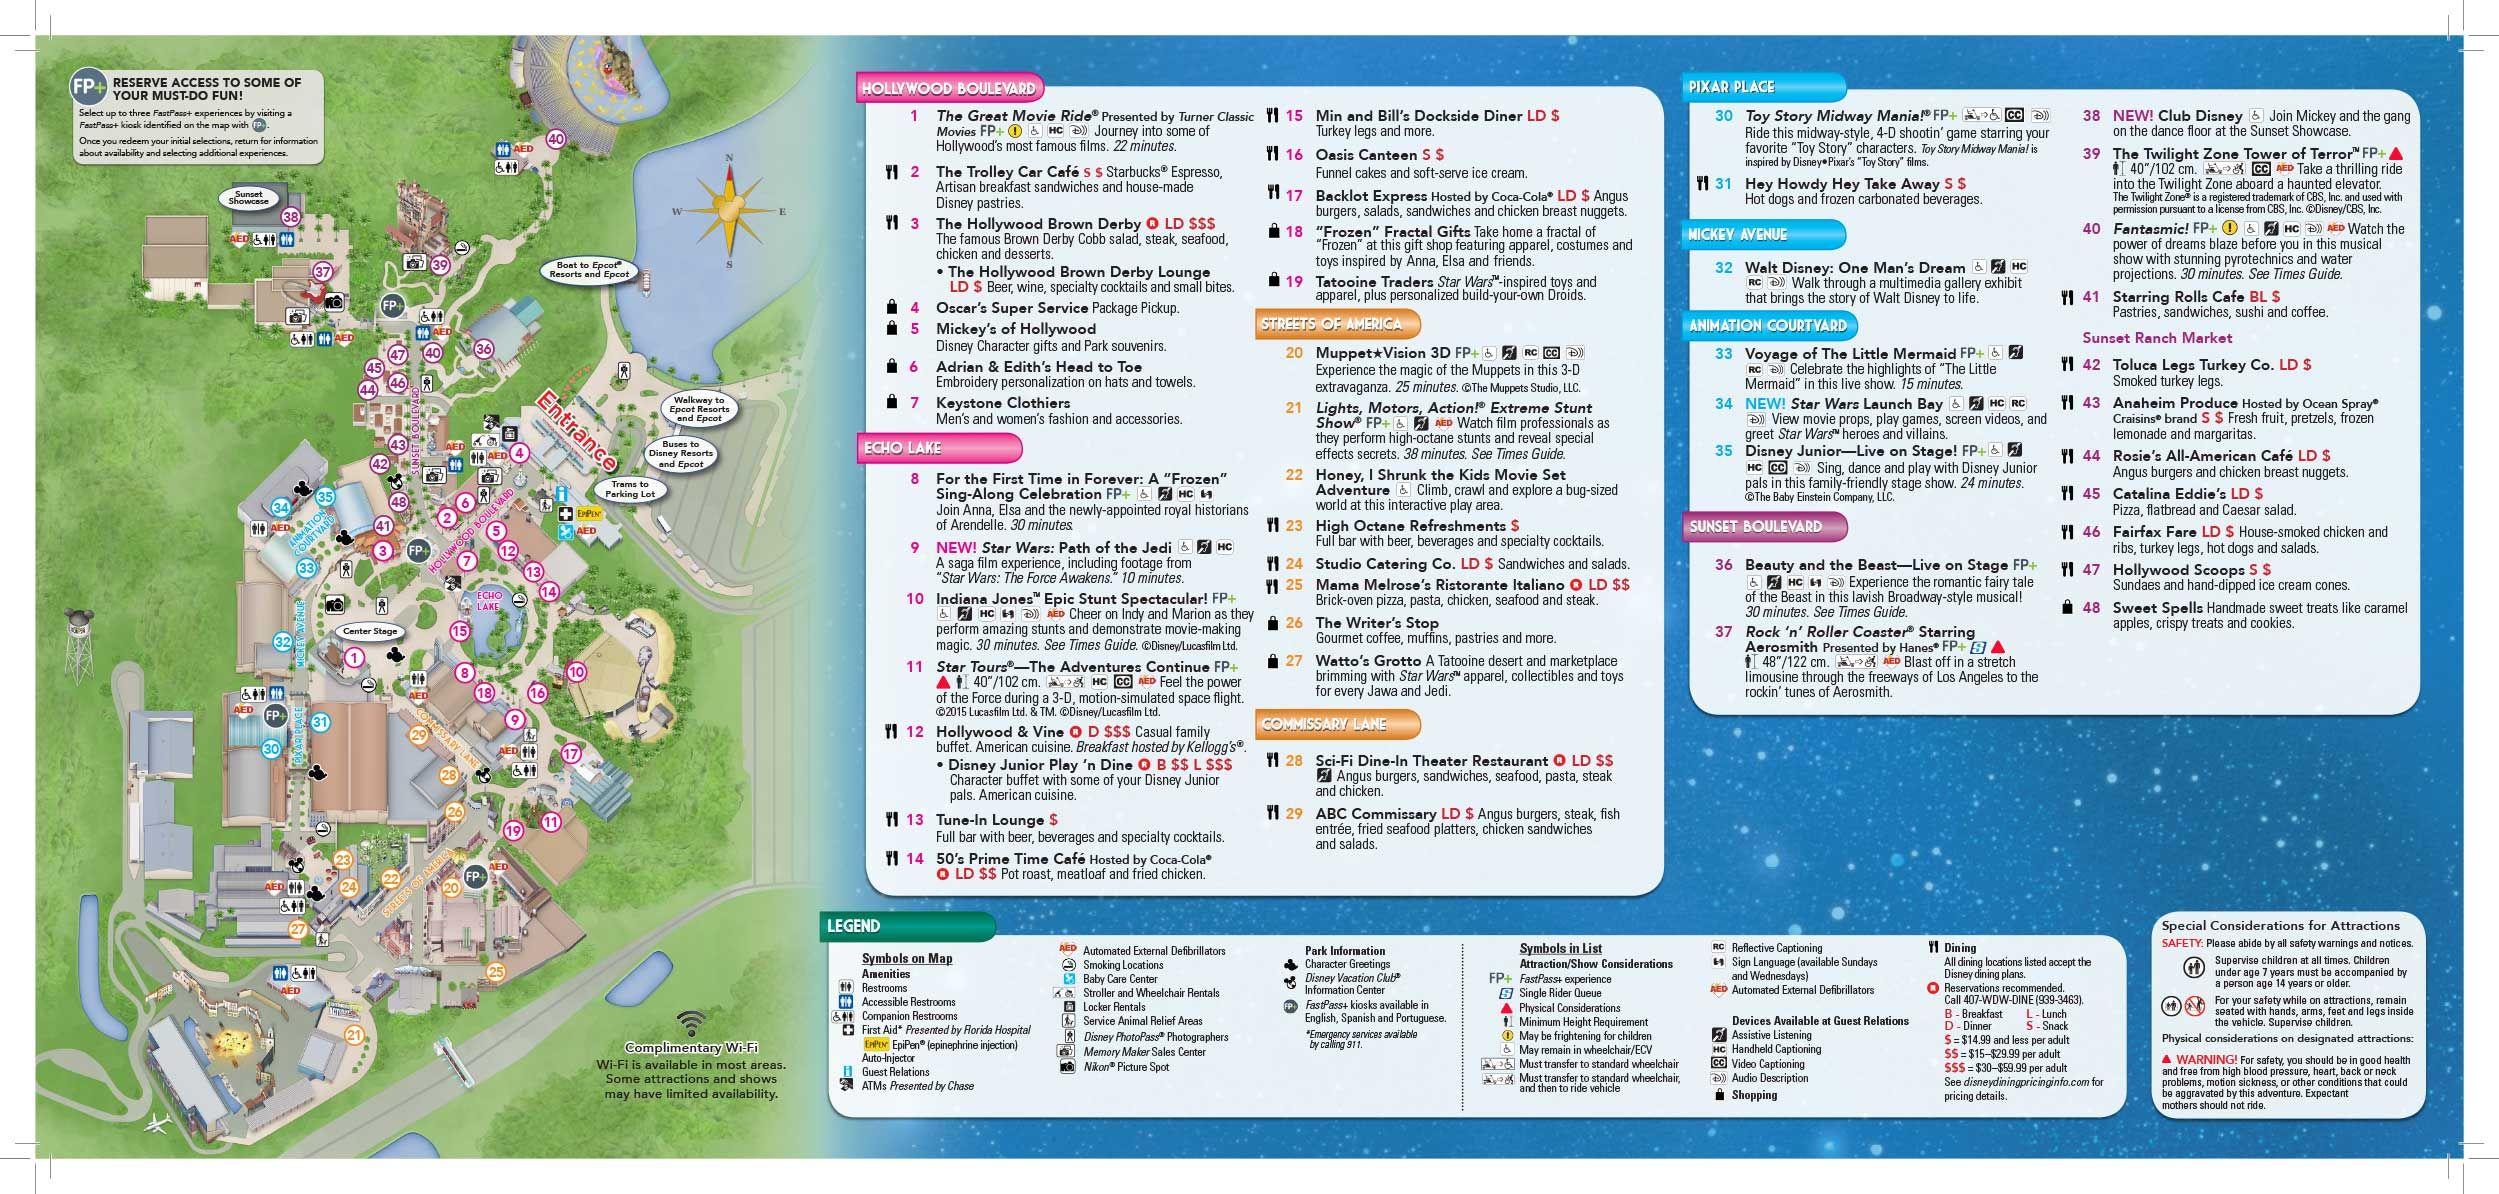 Disney Hollywood Studios map | vacation | Pinterest | Disney, Disney ...